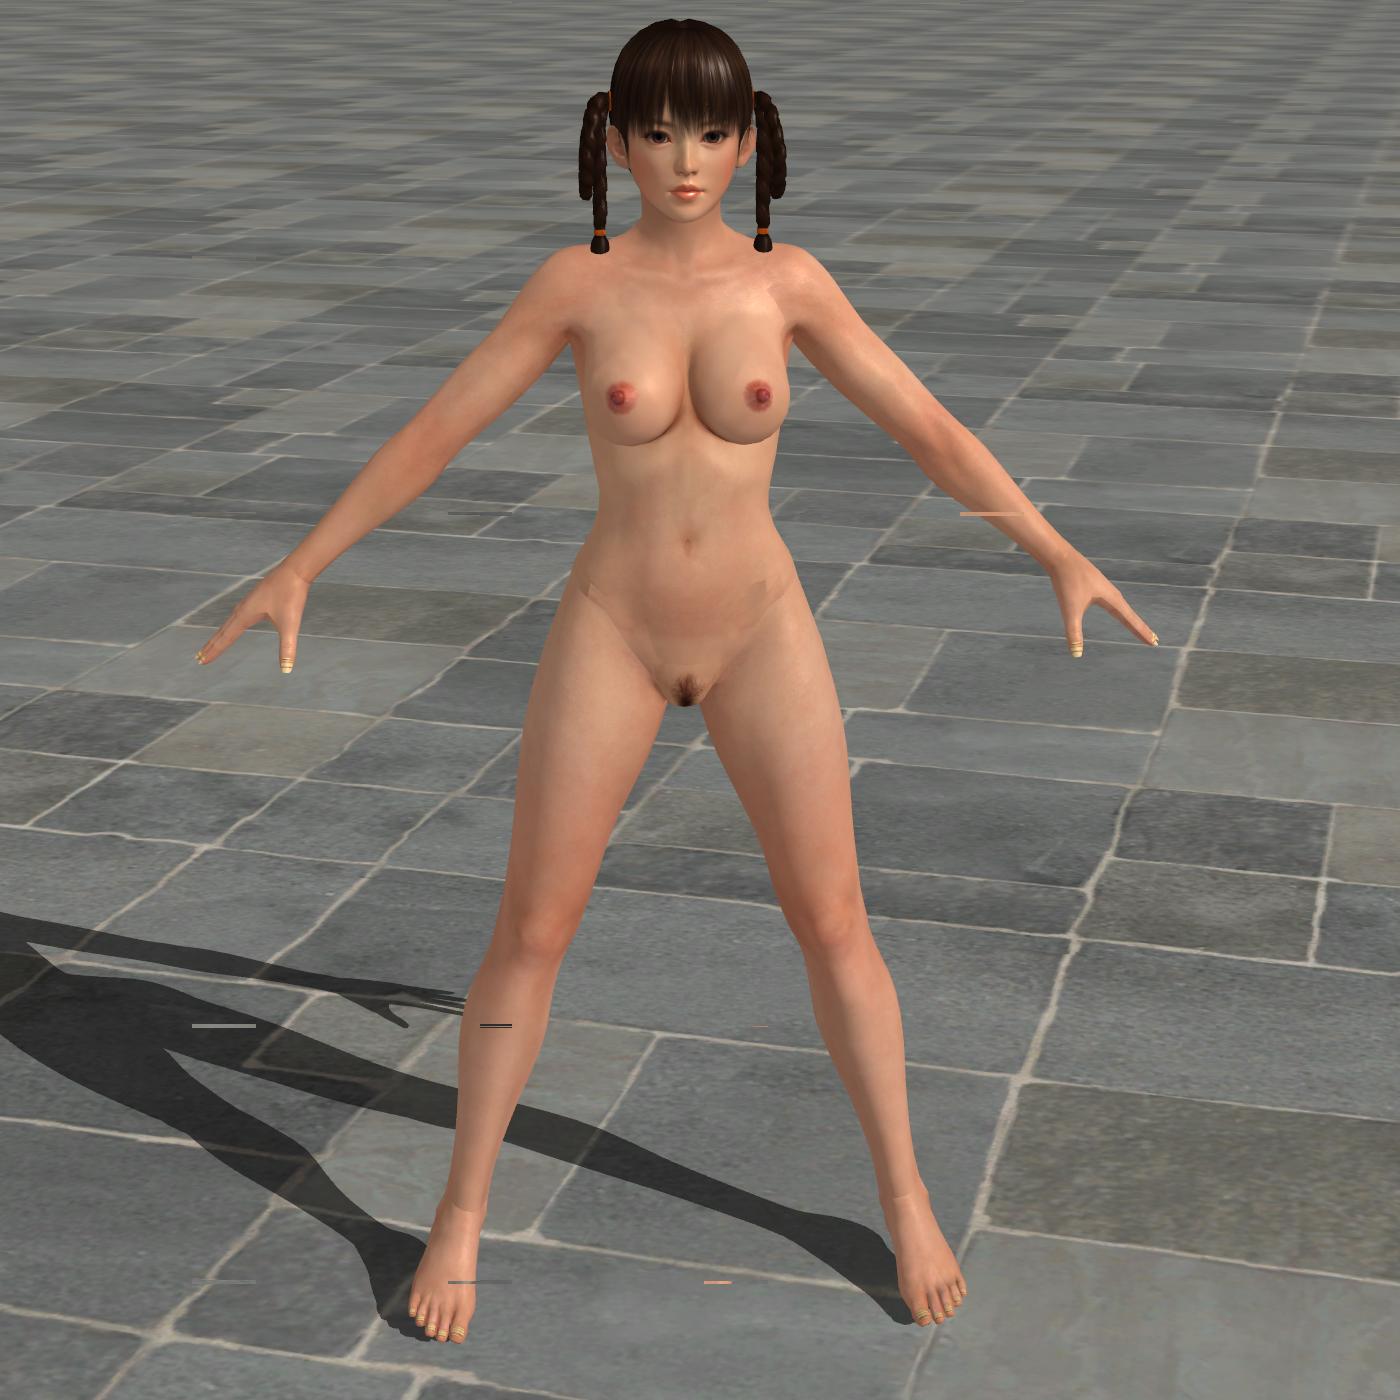 Doa 5 leifang naked naked comic